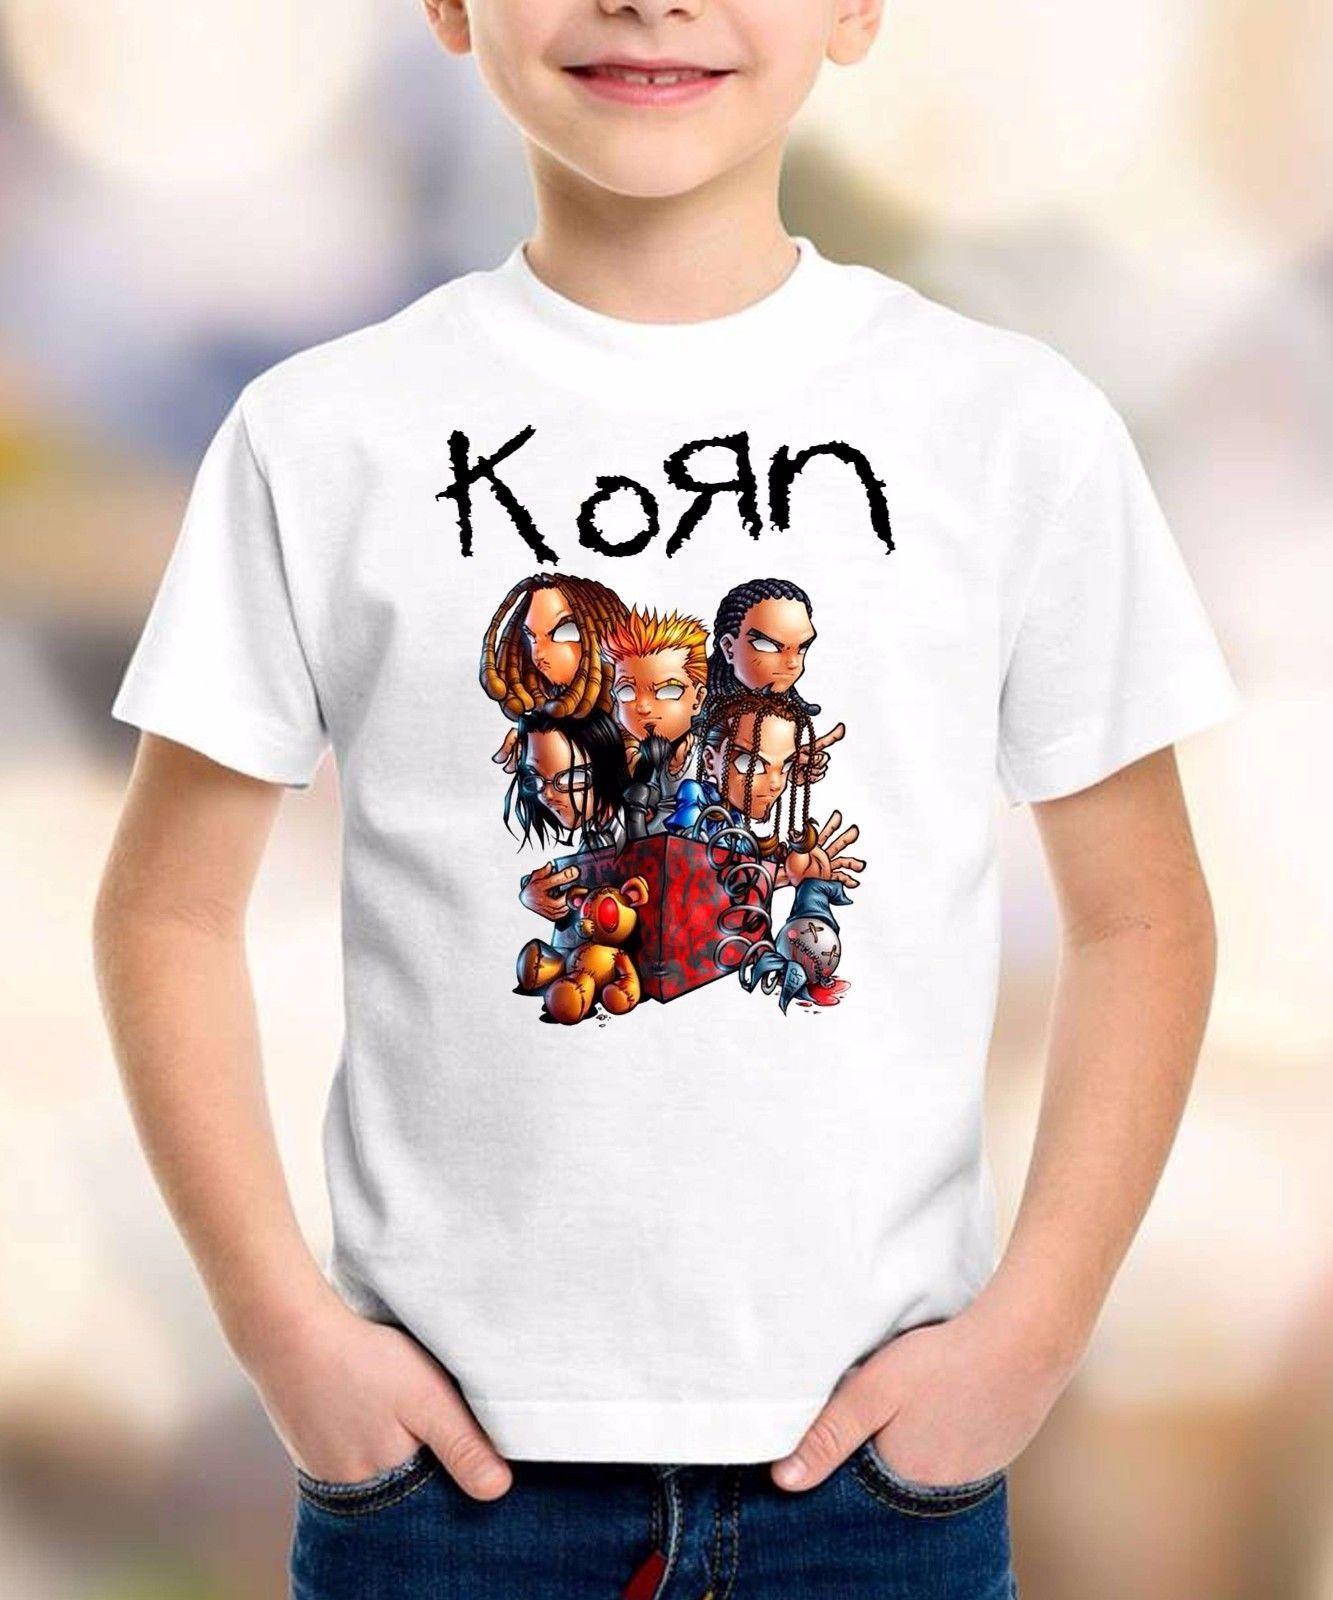 korn cartoon t-shirt korn t shirt children clothing toddler kid size:1-8years